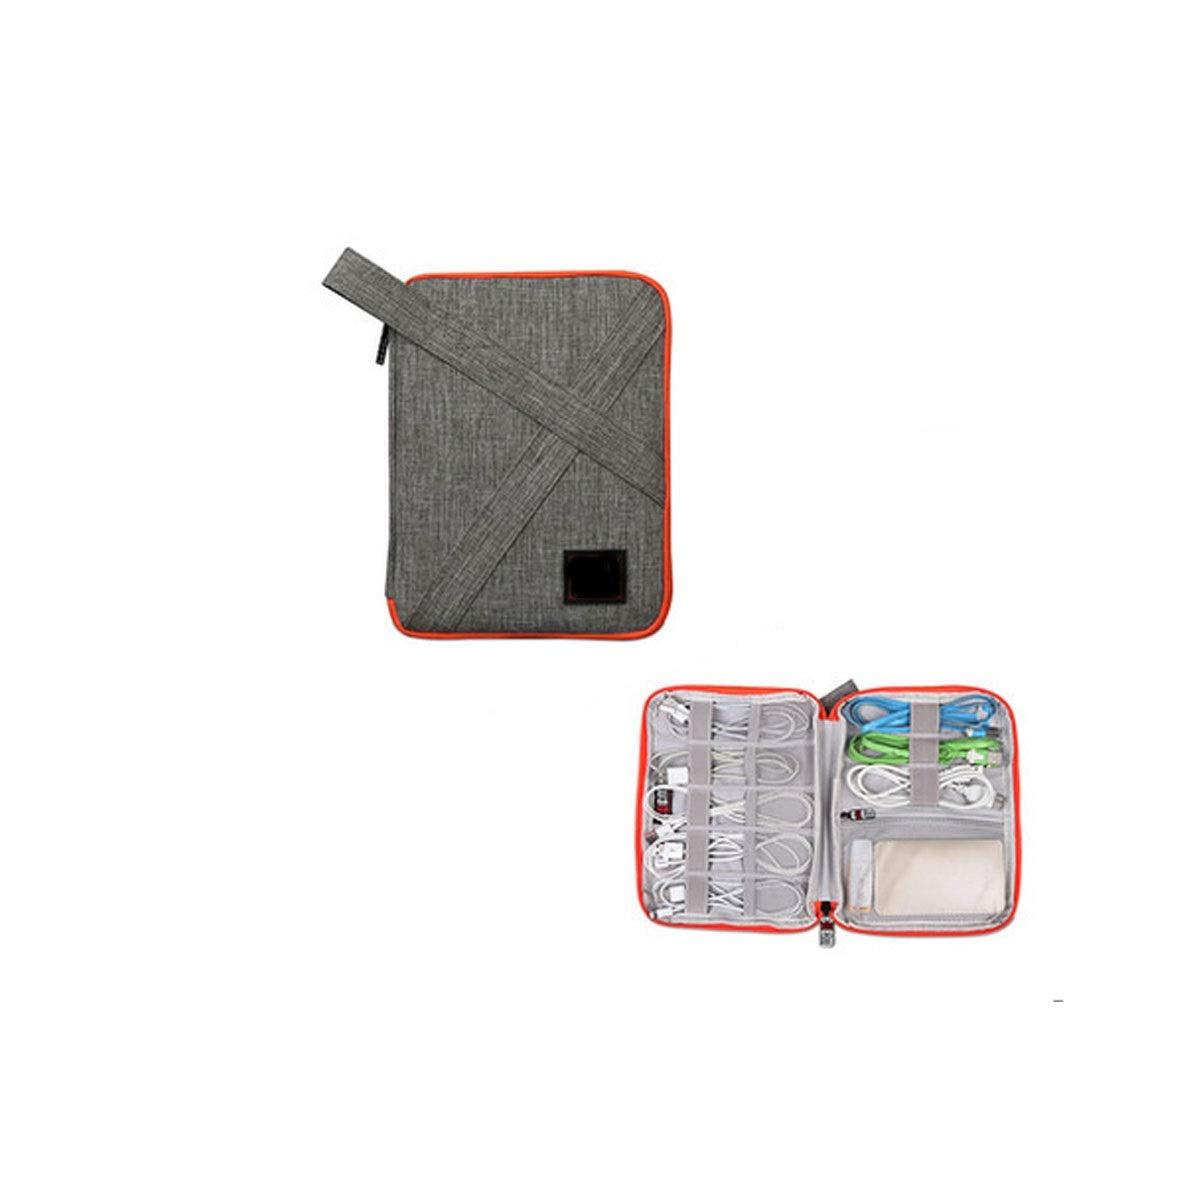 Huijunwenti Electronic Organizer,Cable Organizer,Carry case,Wire Storage Bag, Digital Data Cable Storage Bag, Charging Treasure U Disk U Shield Mobile Phone Headset Storage Bag, Large